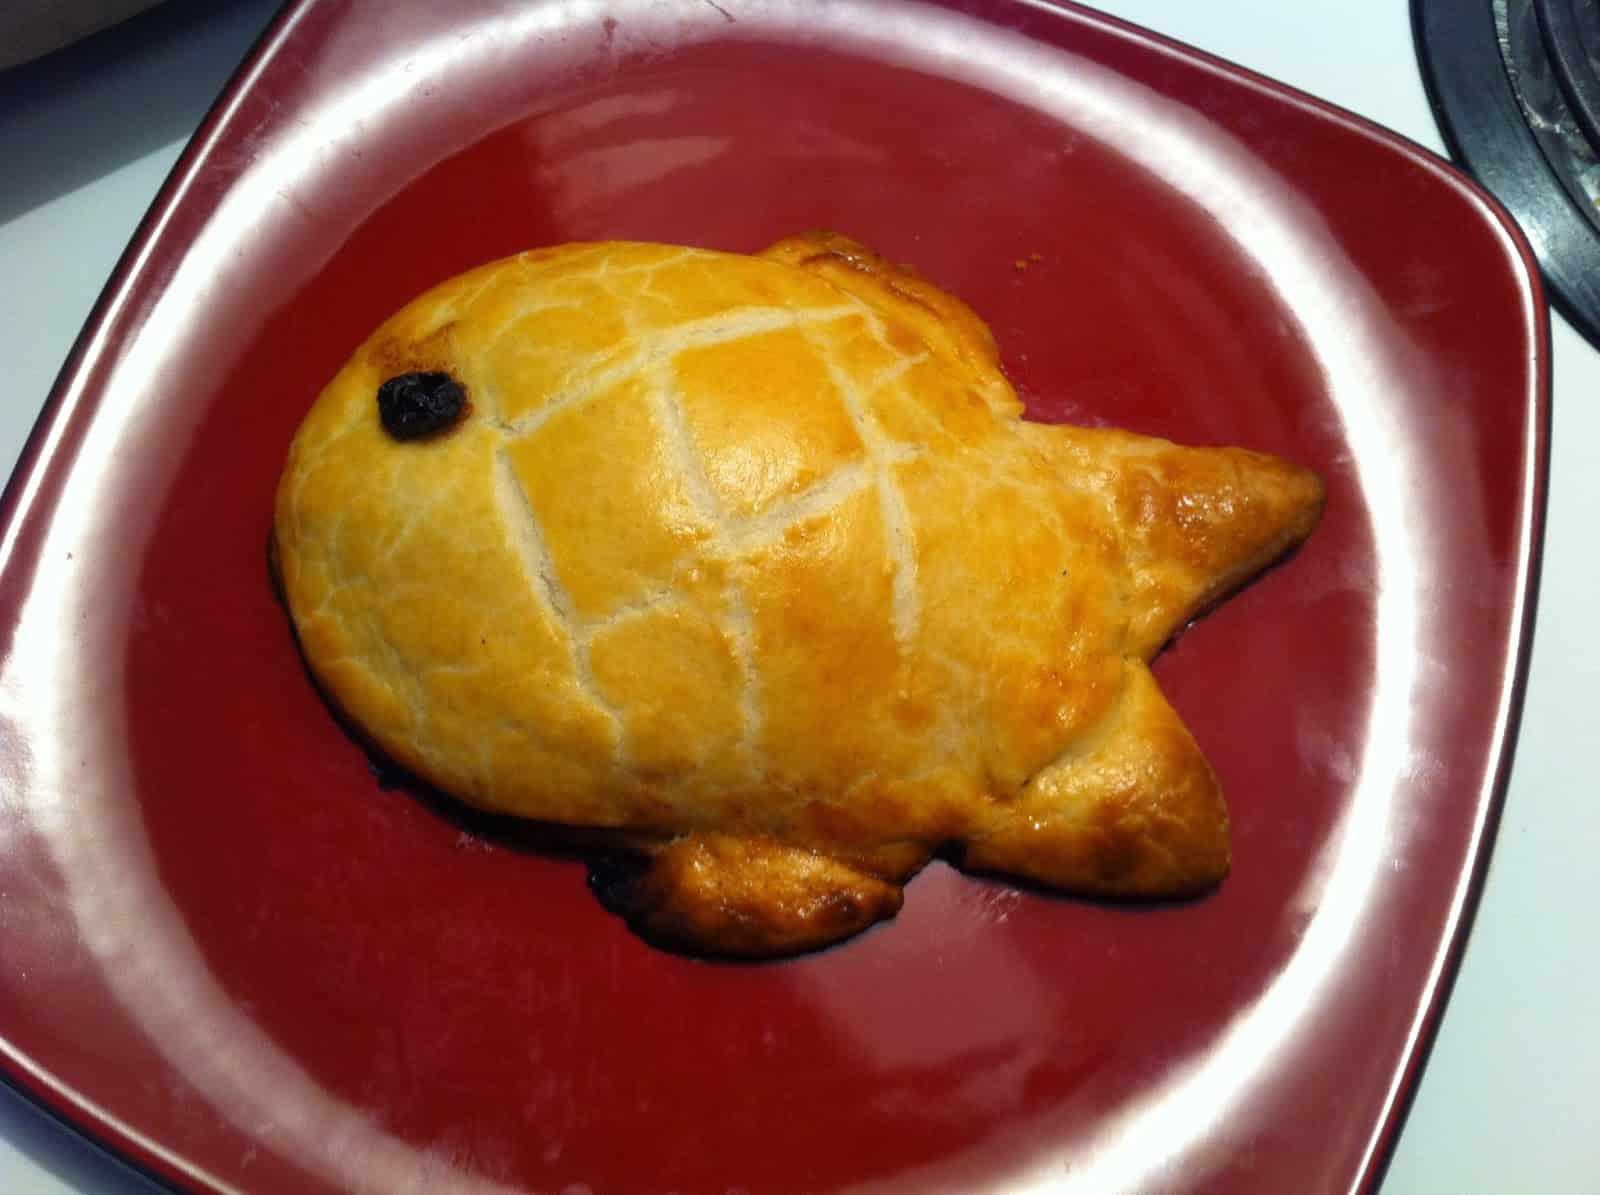 Pastry Fish Recipe From Final Fantasy XIV